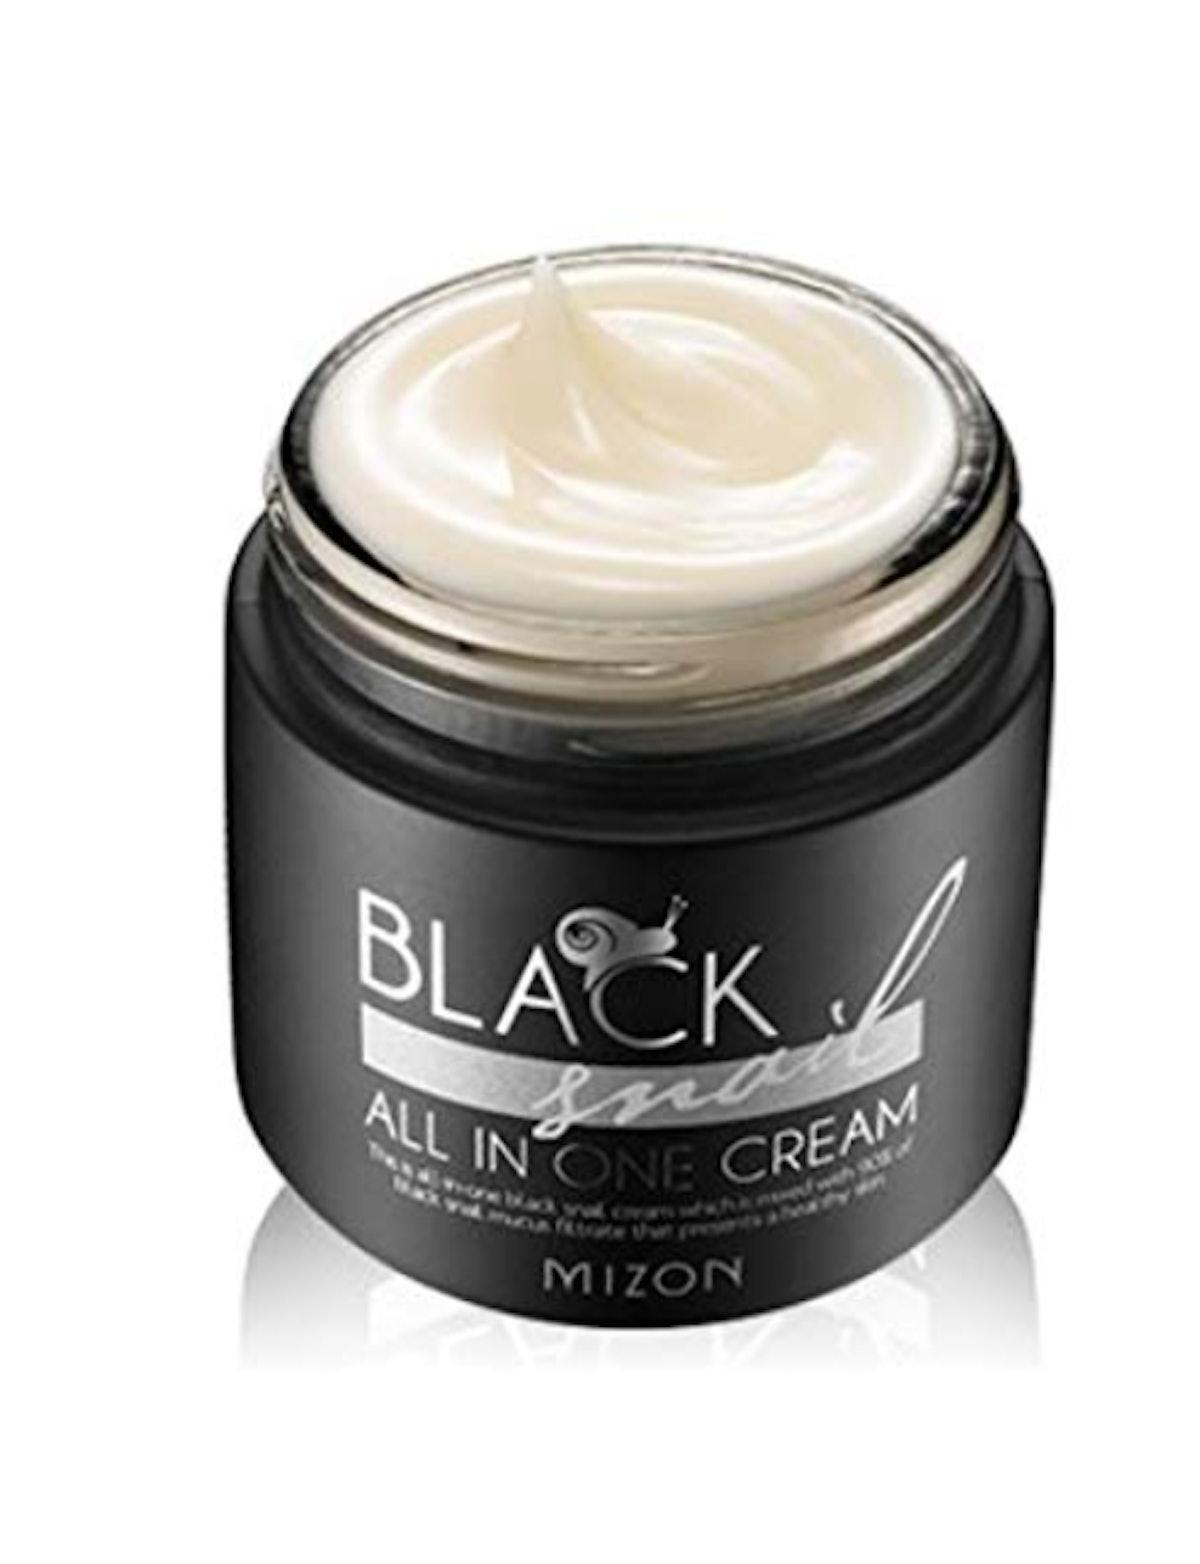 MIZON Black Snail Cream